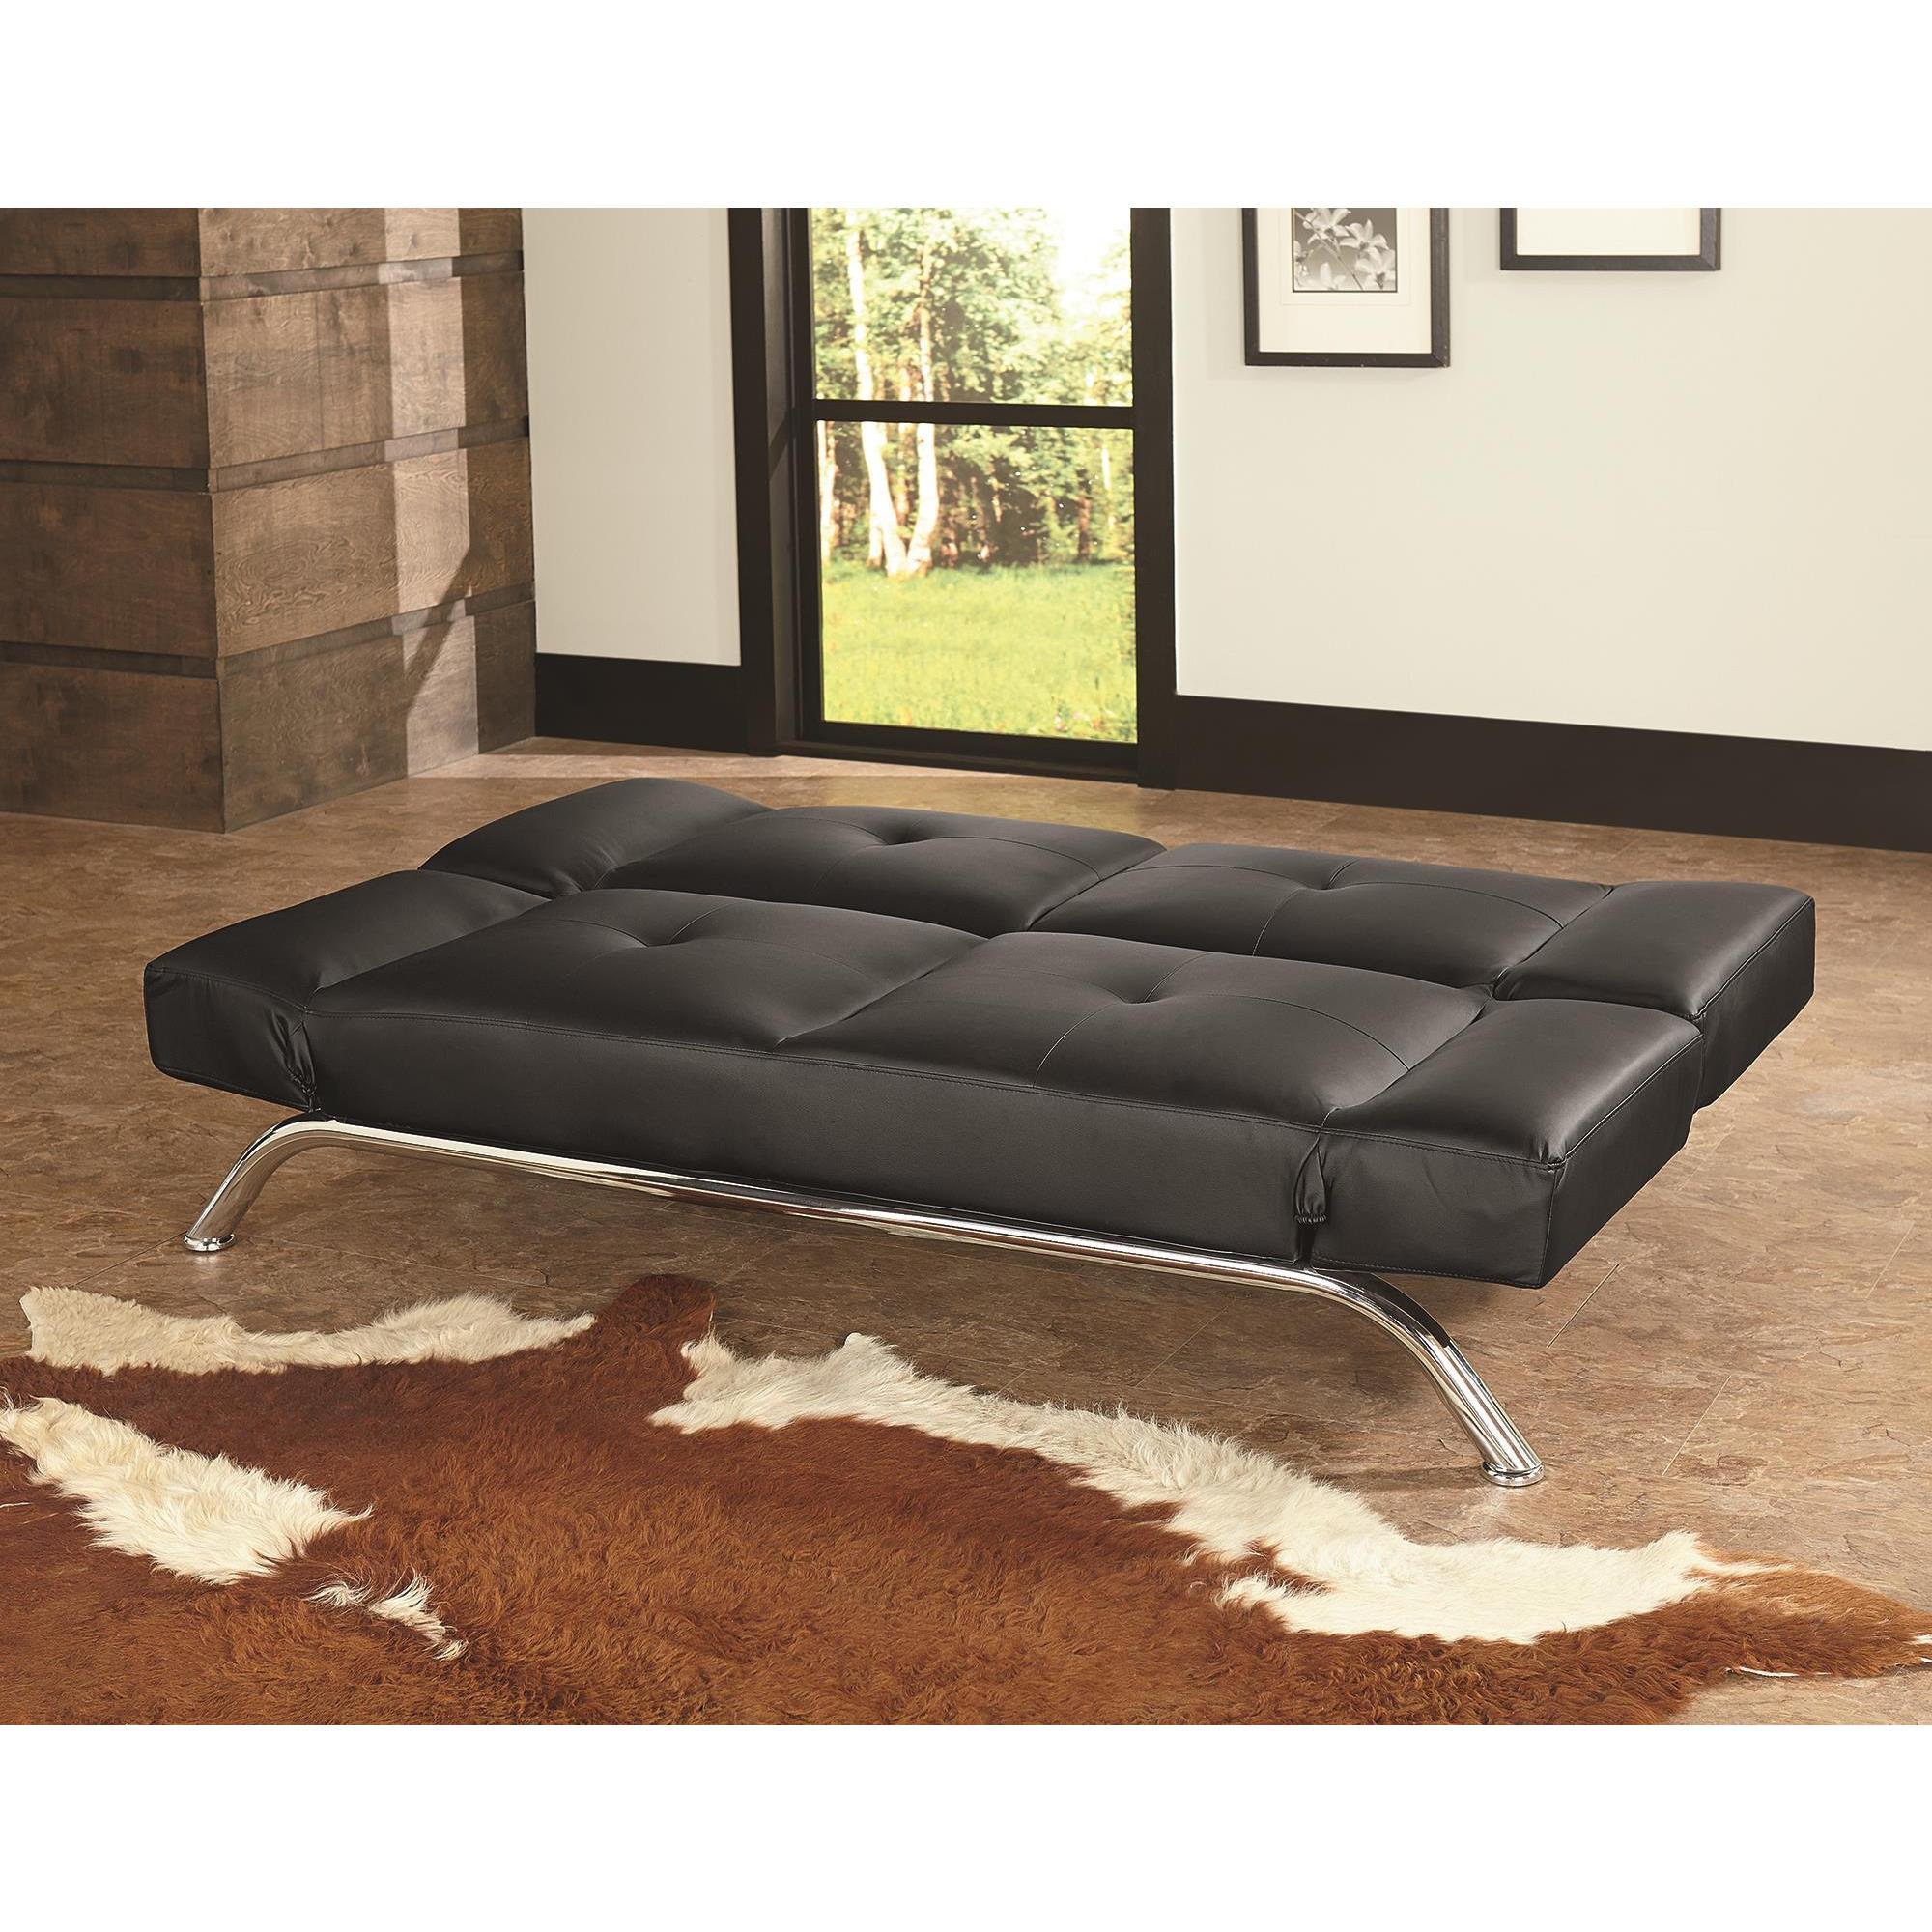 Shop Dhp Premium Emma Convertible Futon Sleeper Overstock 10755618